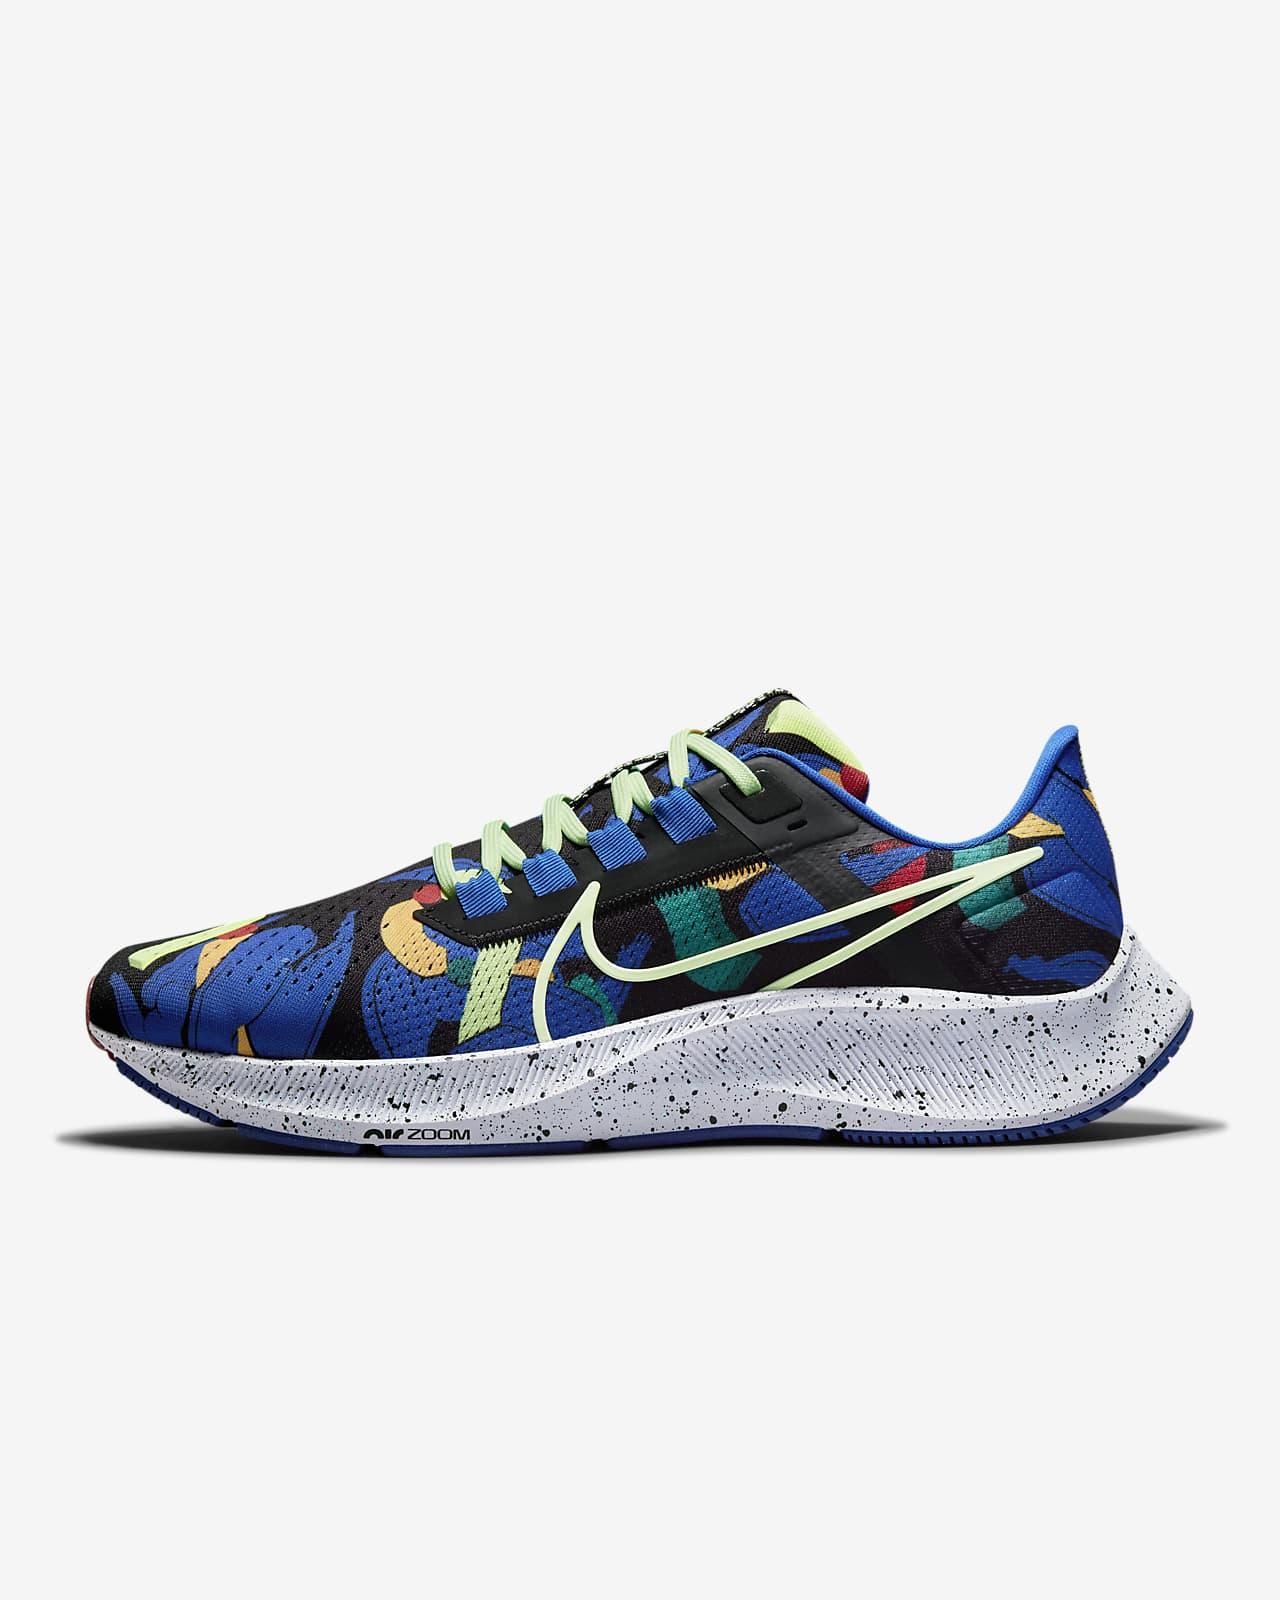 Nike Air Zoom Pegasus 38 A.I.R.Calzado de running en carretera para hombre Kelly Anna London